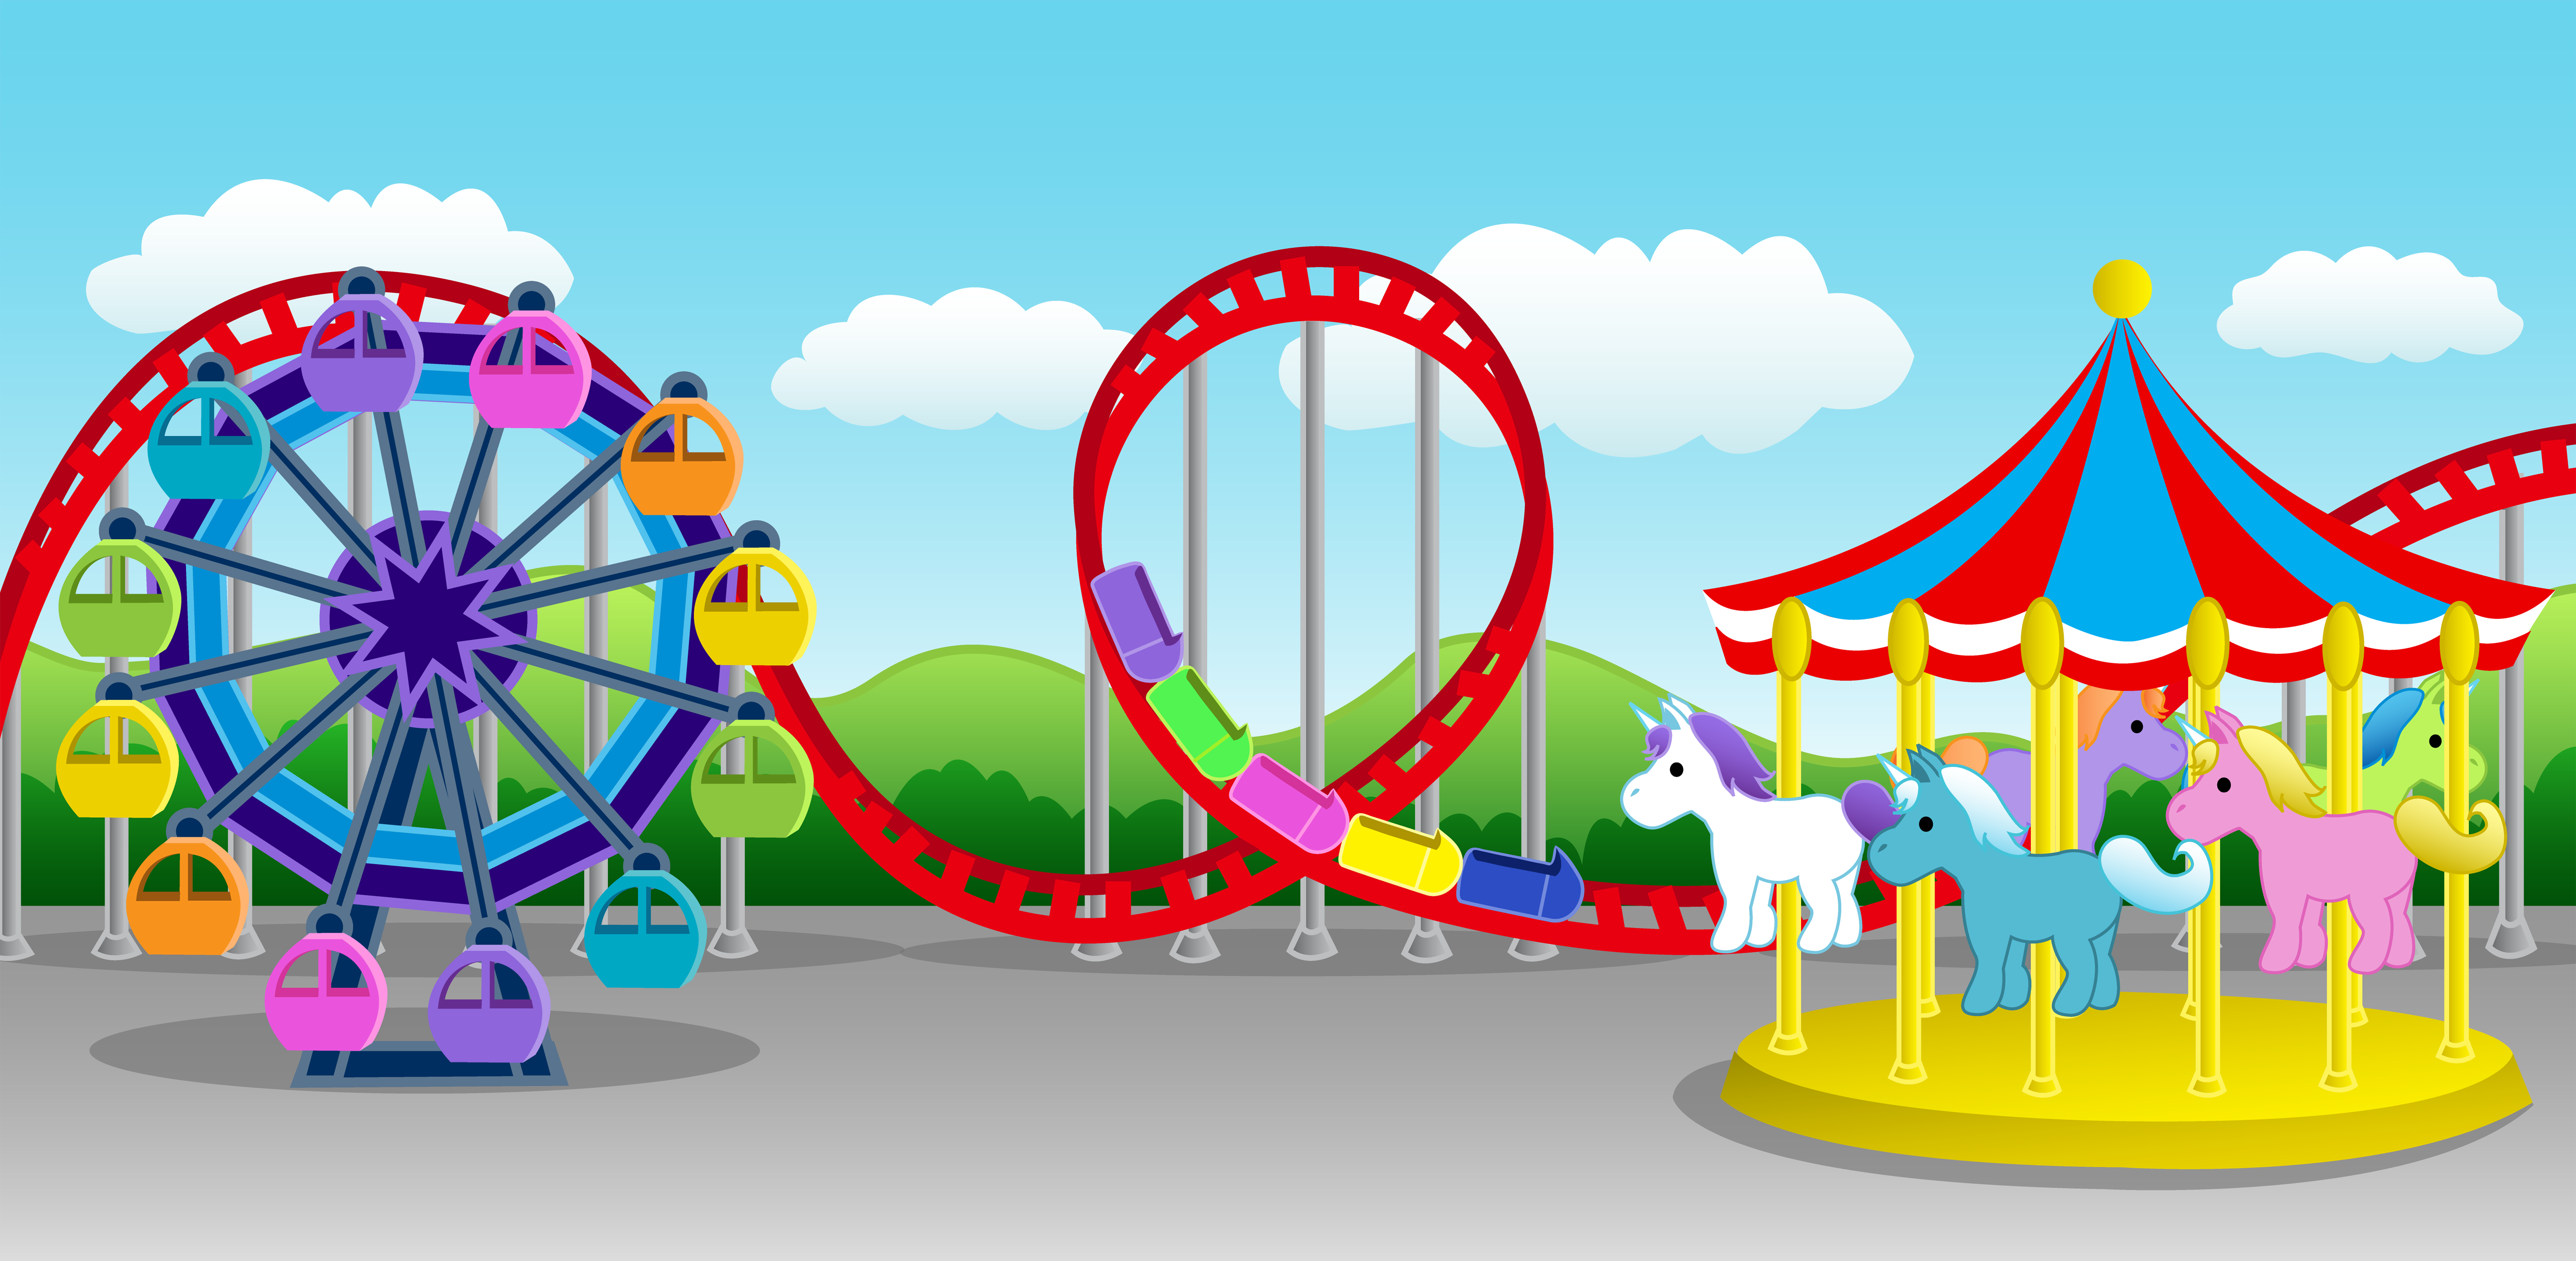 Carousel clipart kids carnival Carnival 6 3 Carnival art